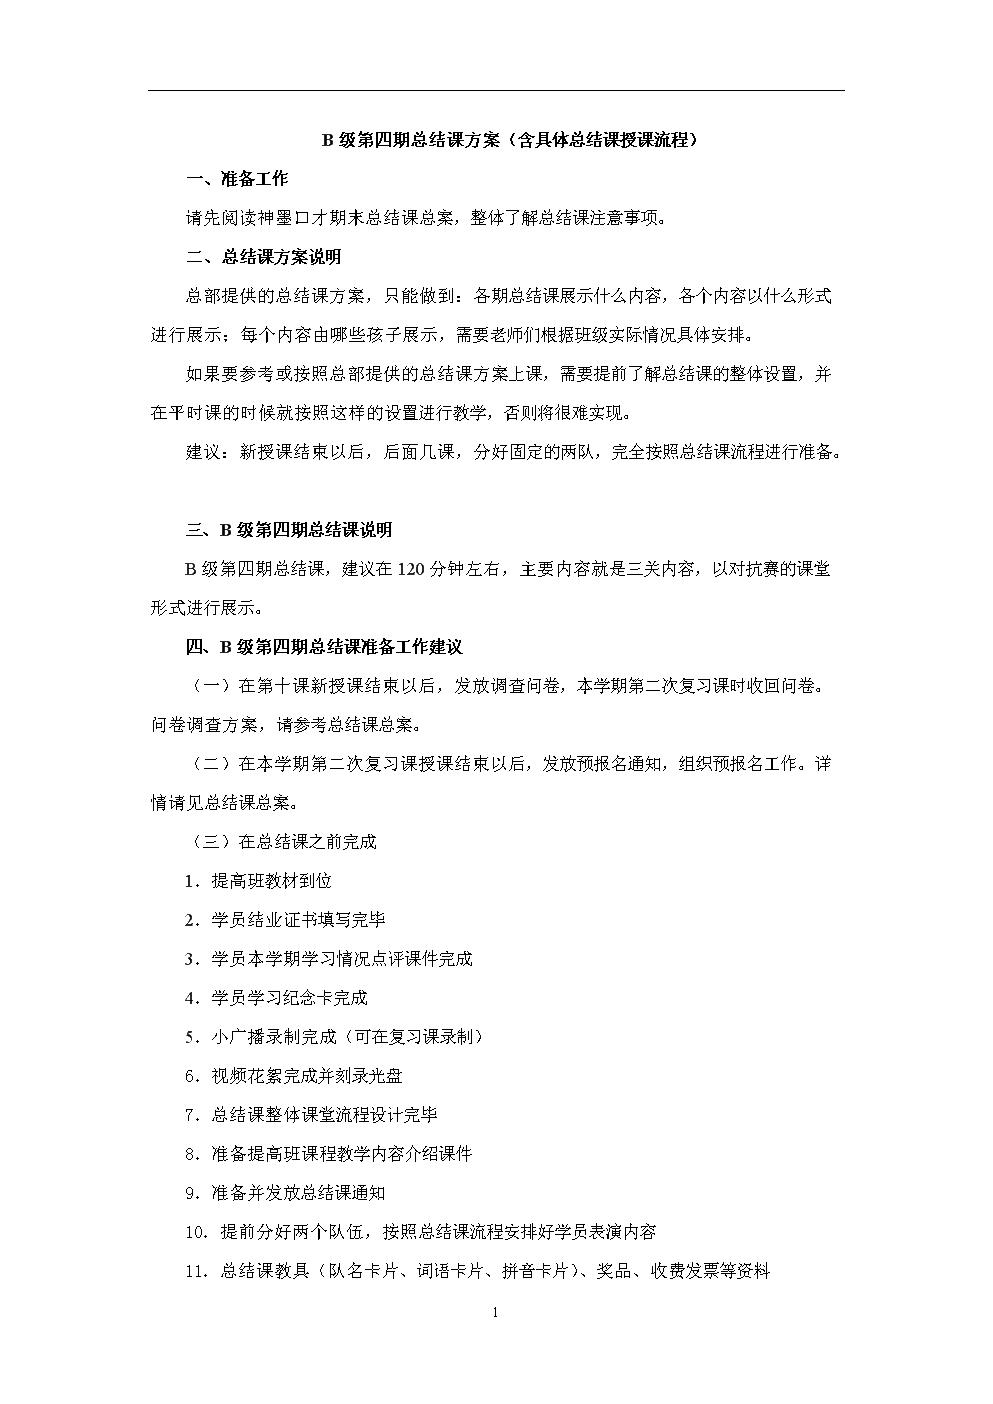 B级第四期总结课方案 V1.0.doc